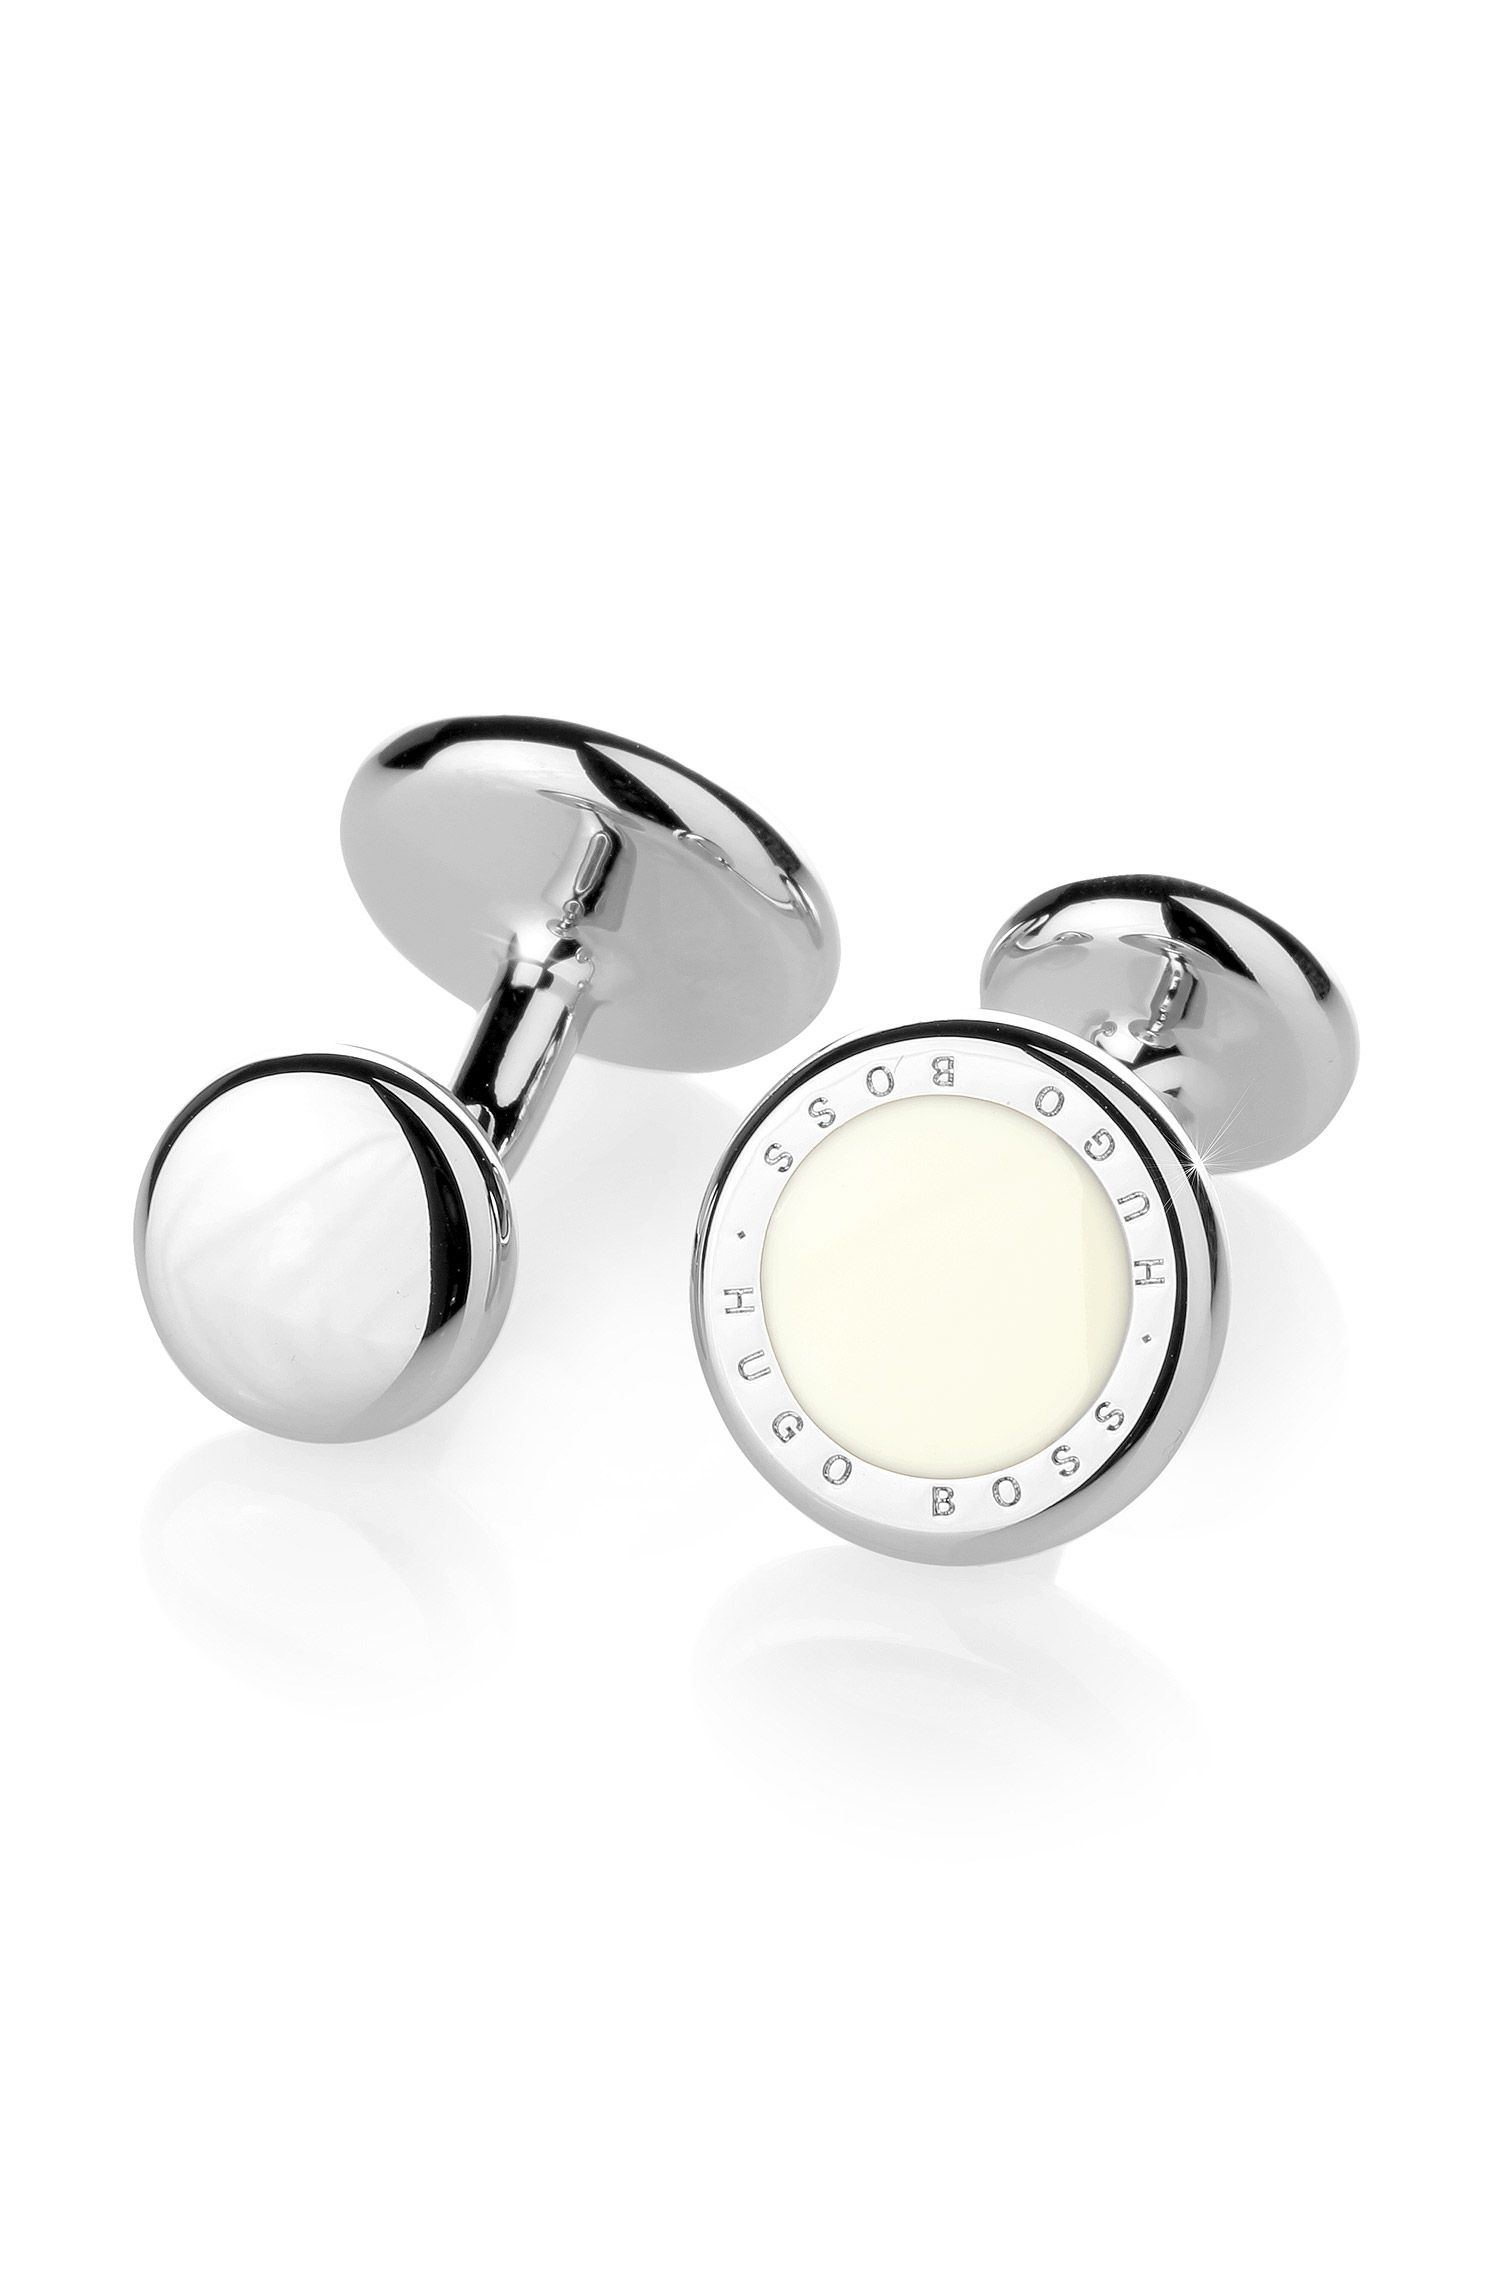 Round metal cufflinks with enamel inlay